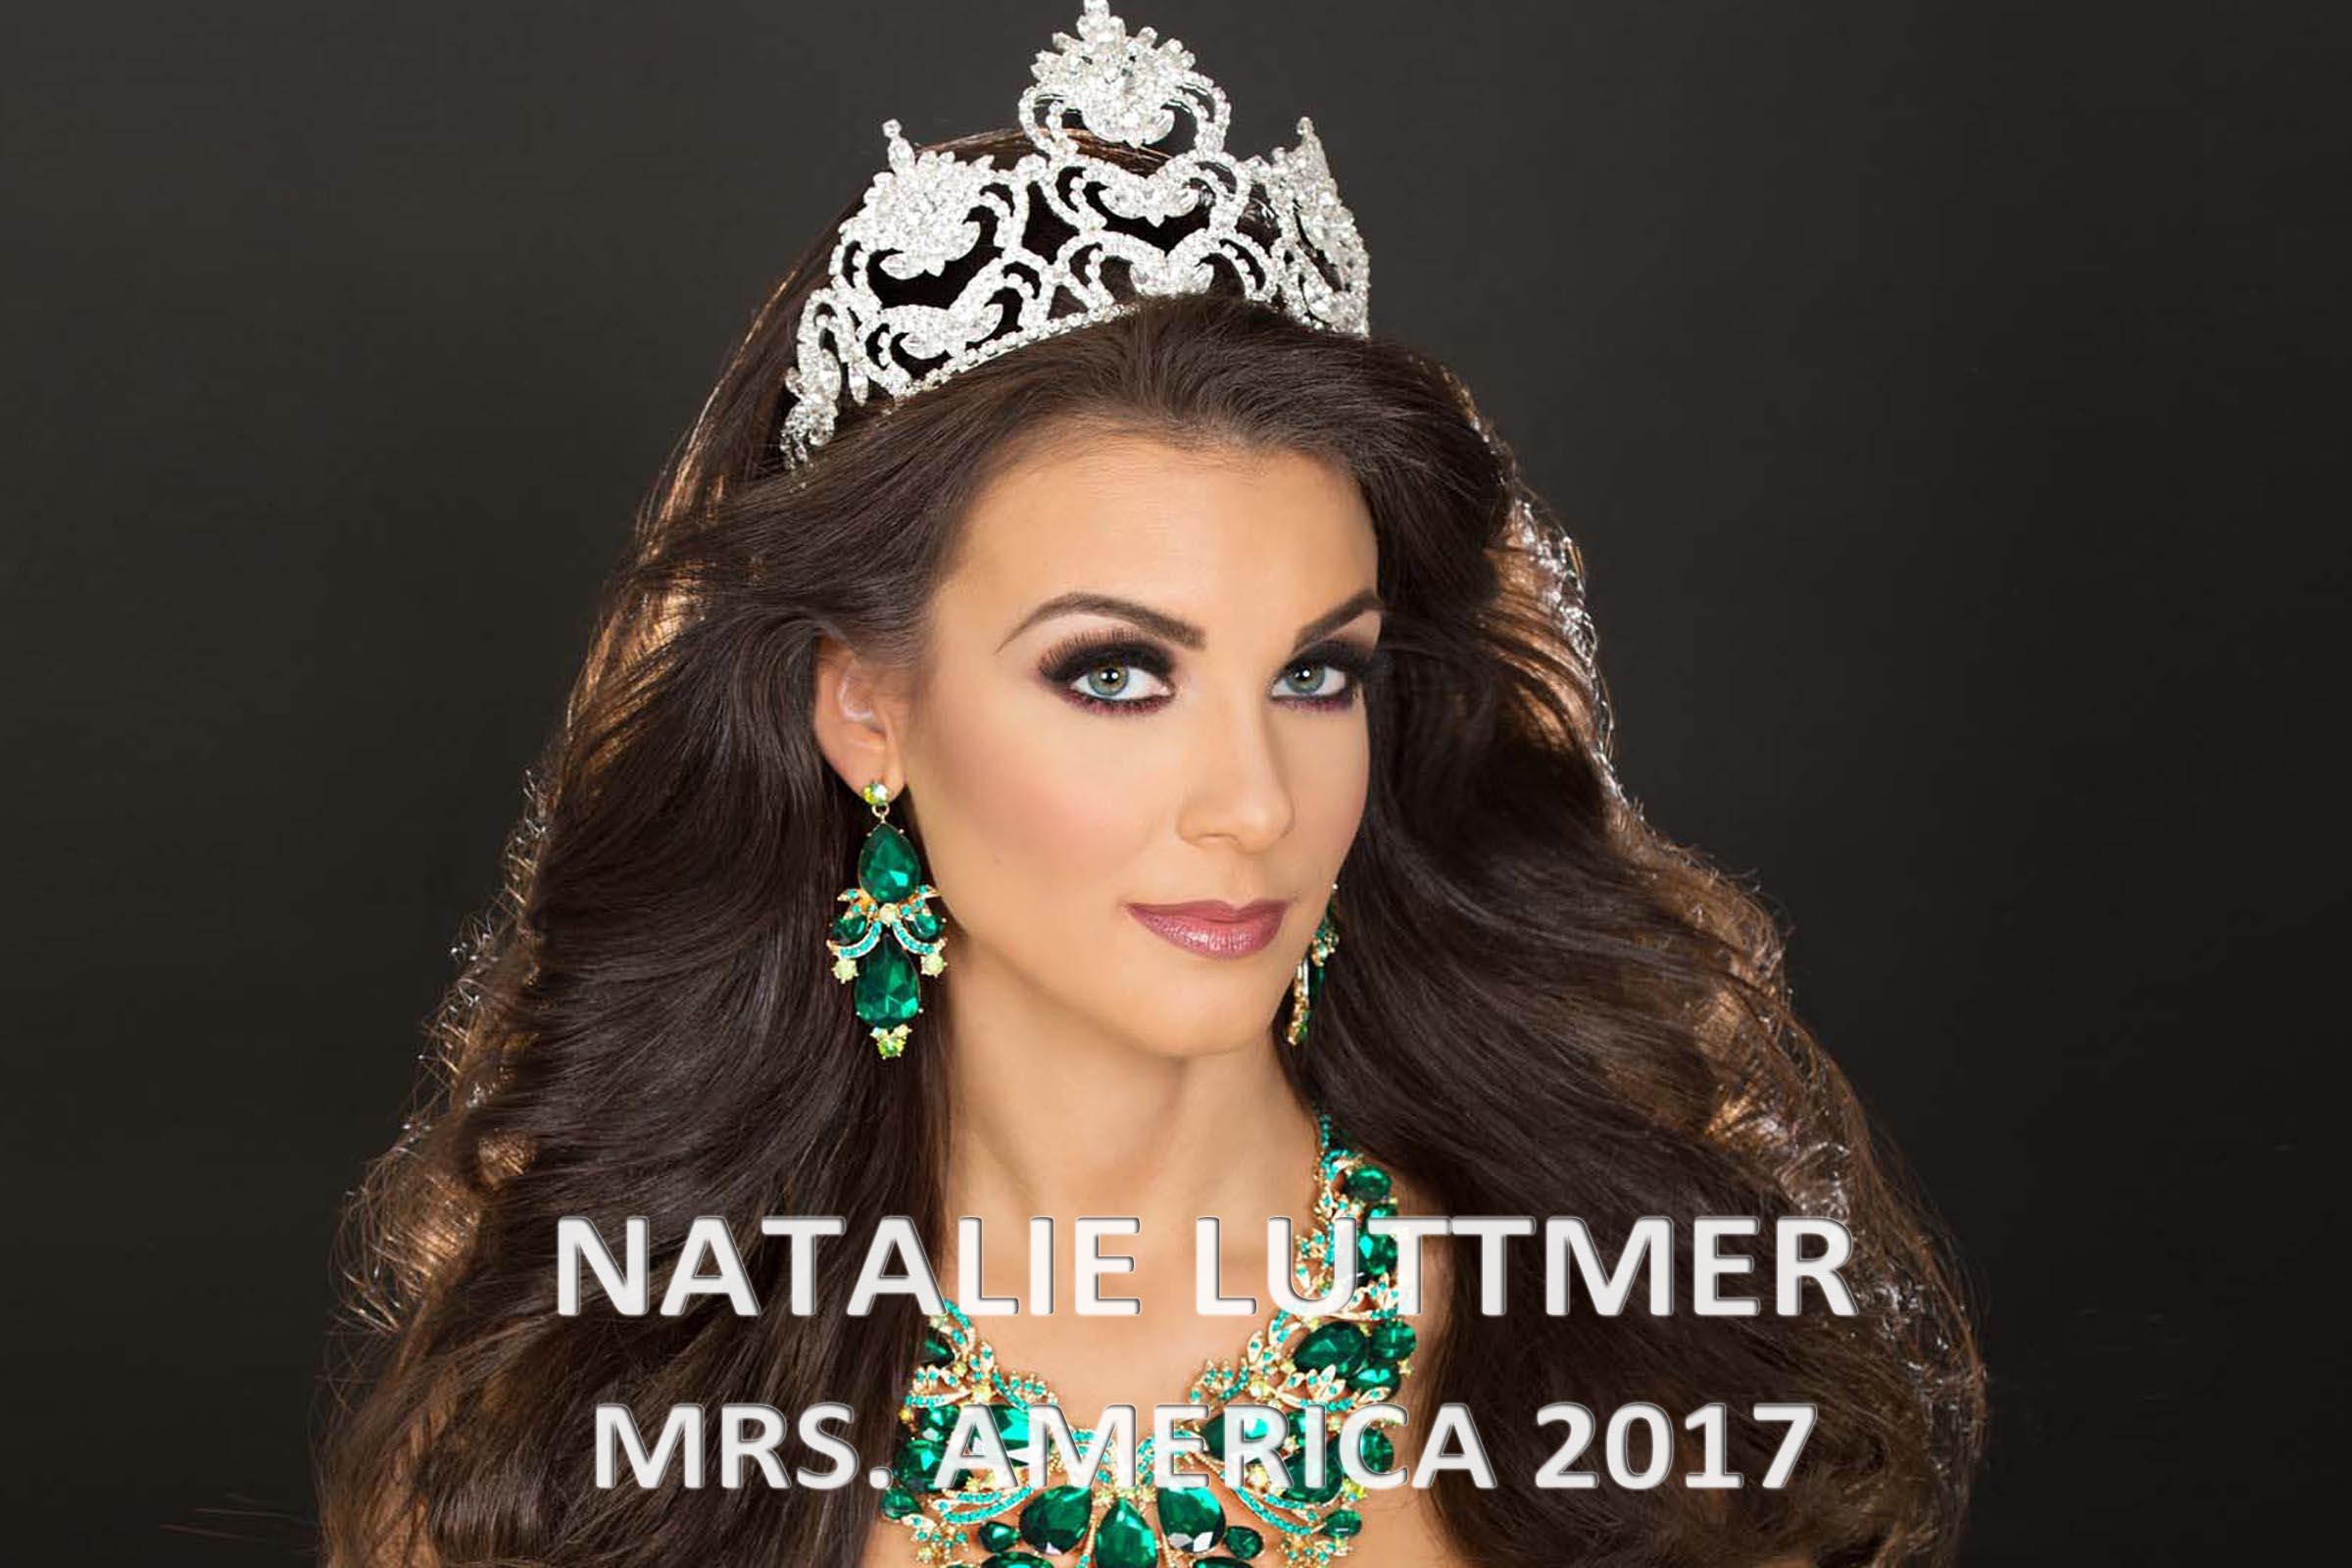 NATALIE LUTTMER SITE